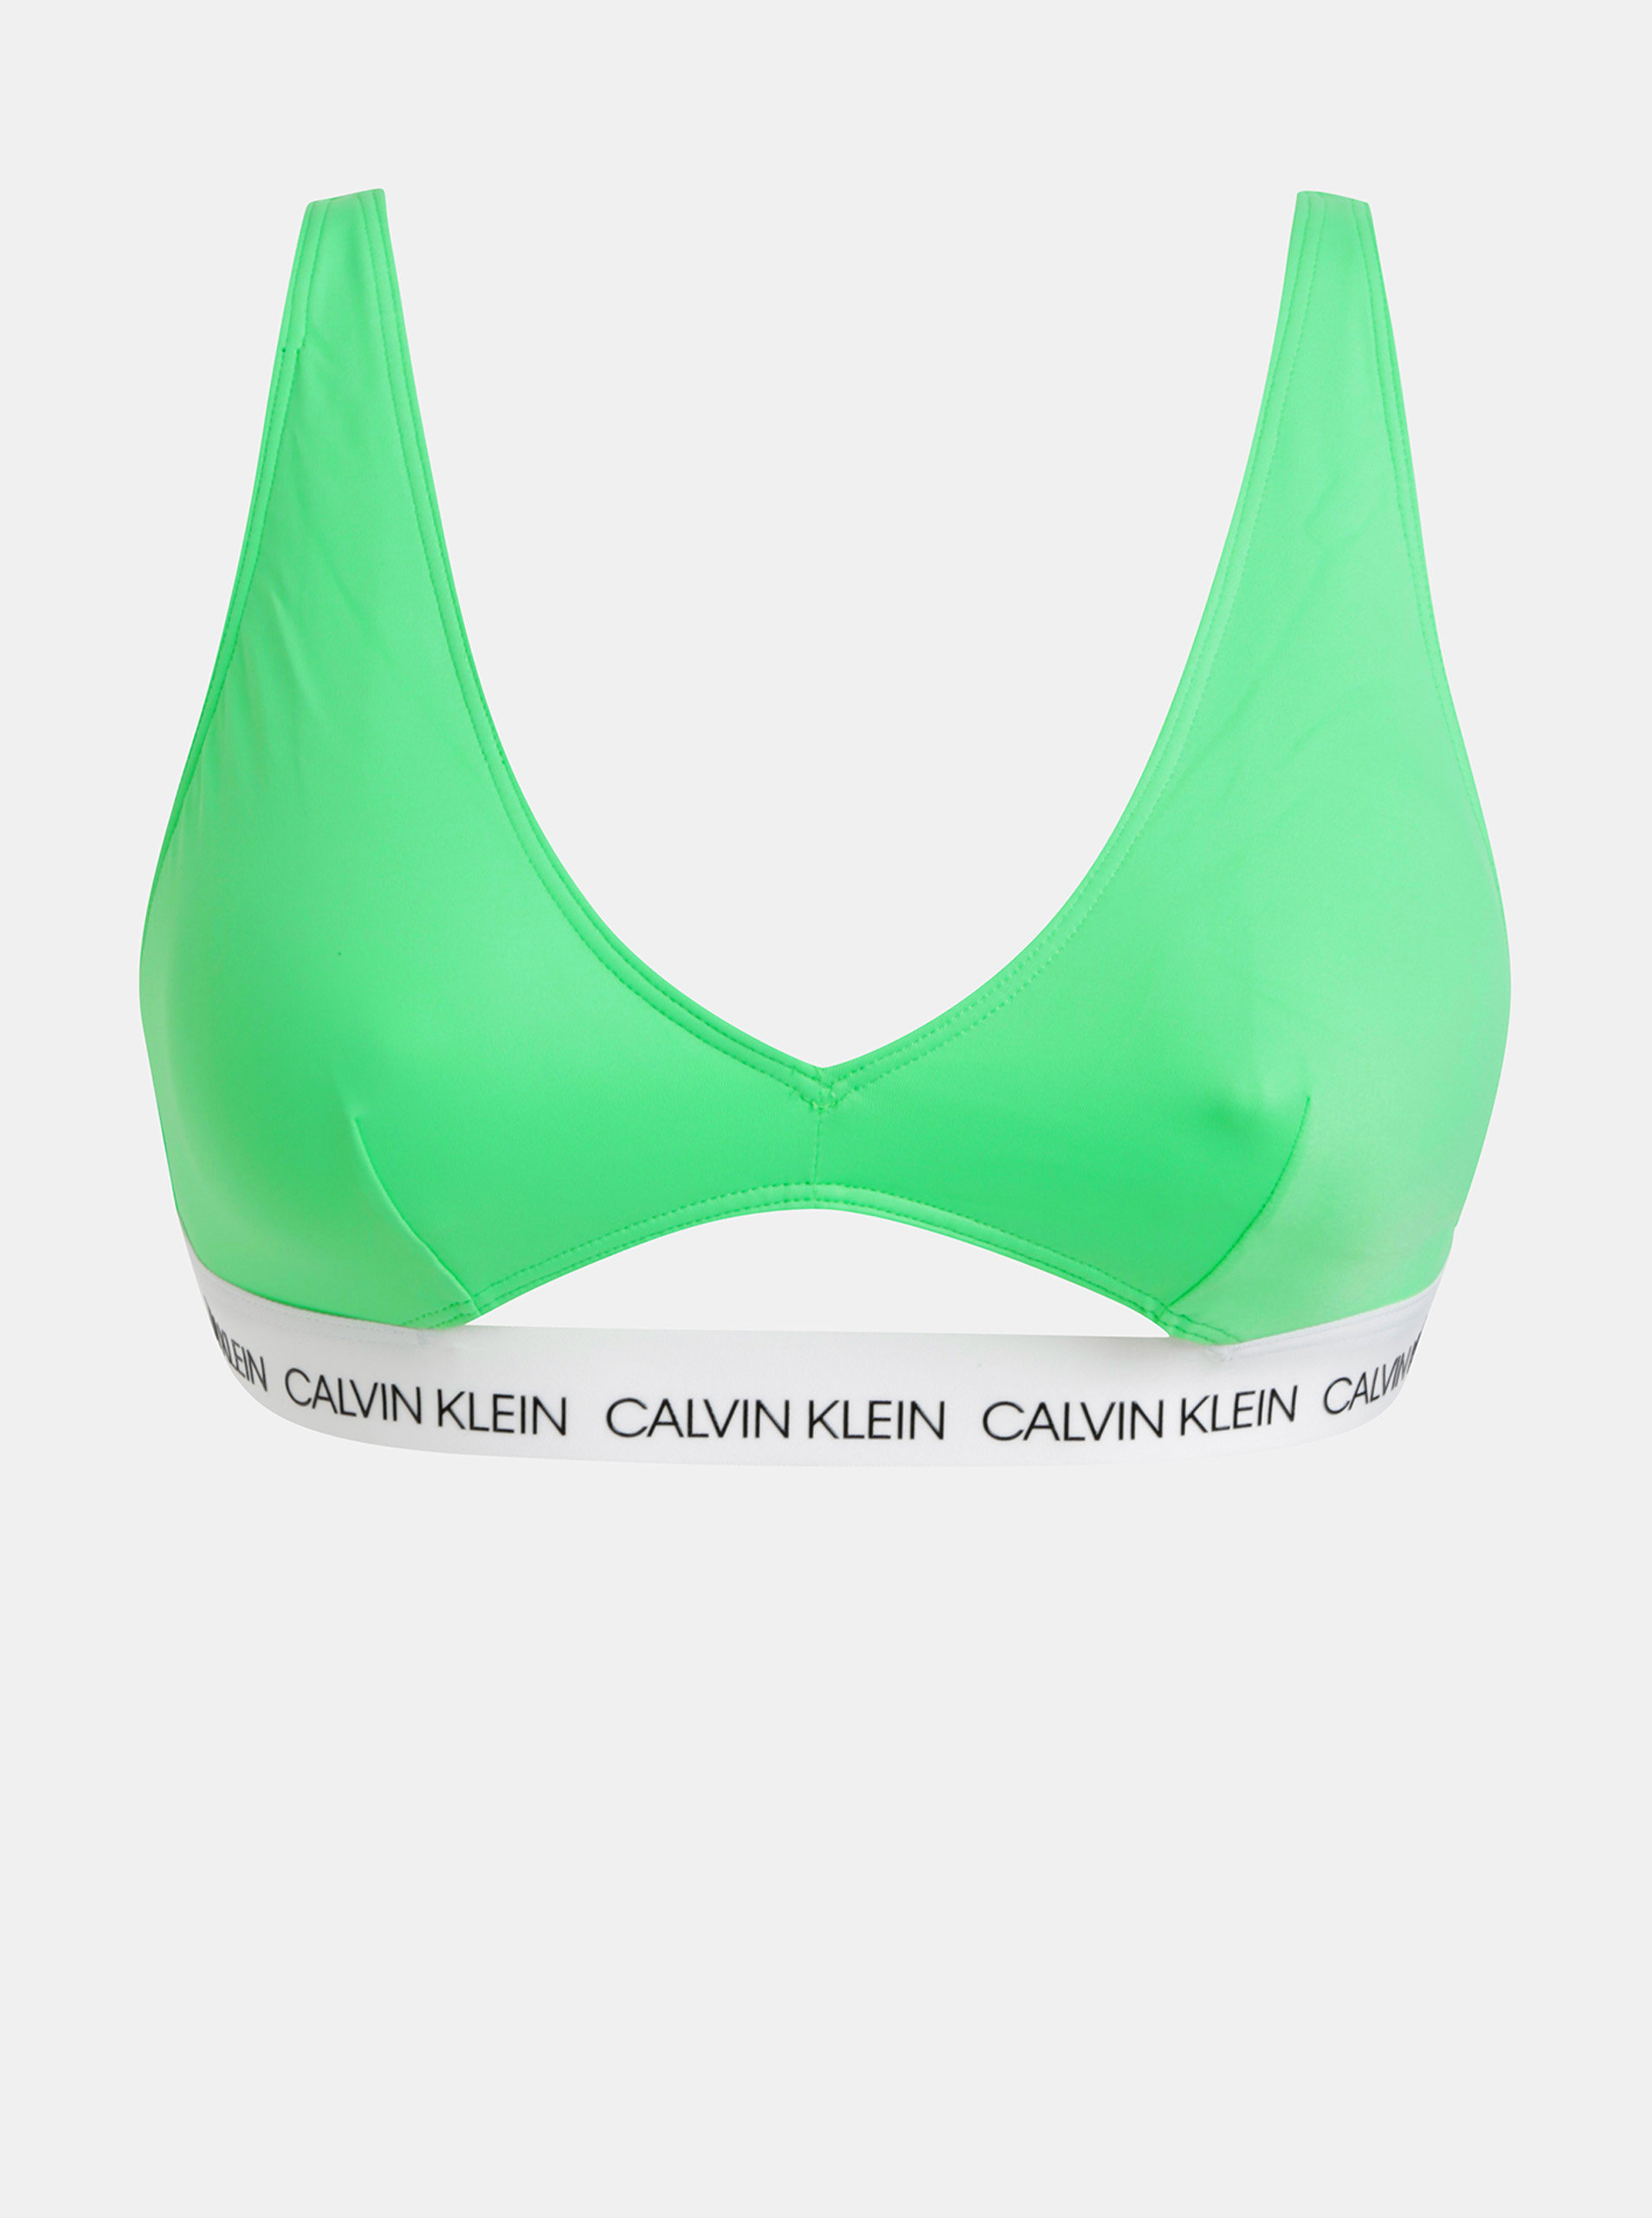 3993e3a663 Zelený vrchný diel plaviek Calvin Klein Underwear ...